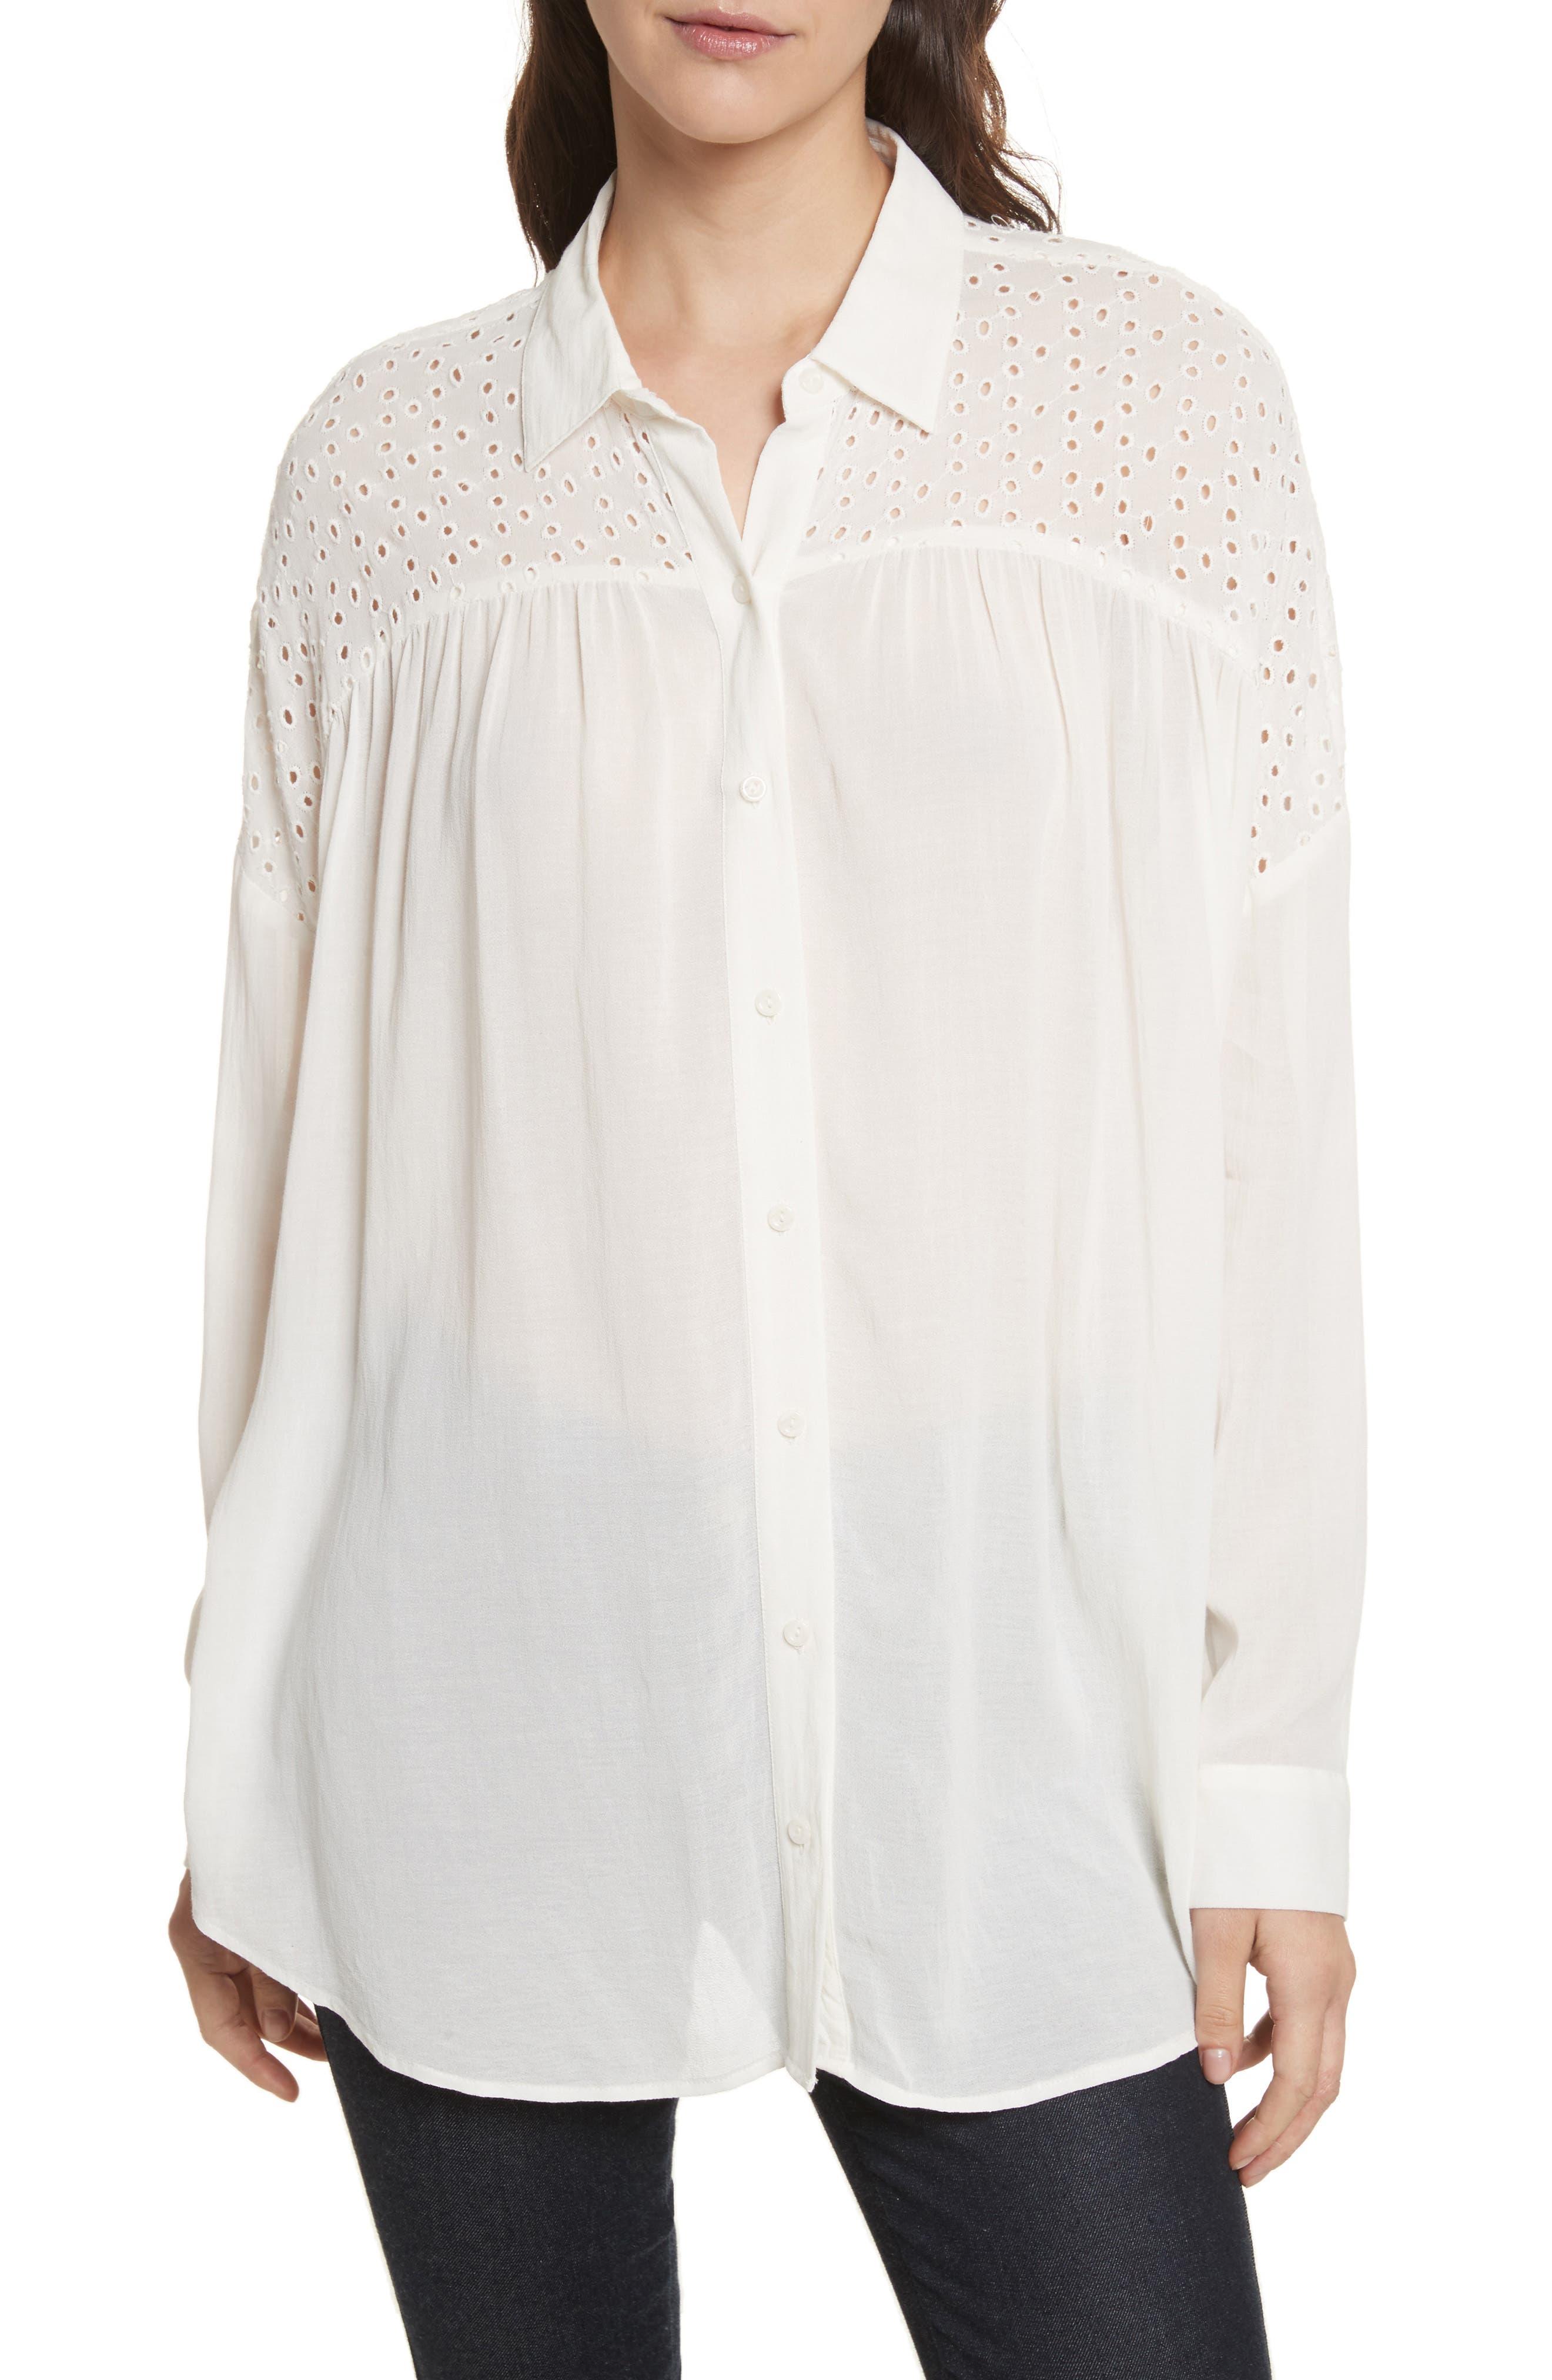 Pearla Shirt,                             Main thumbnail 2, color,